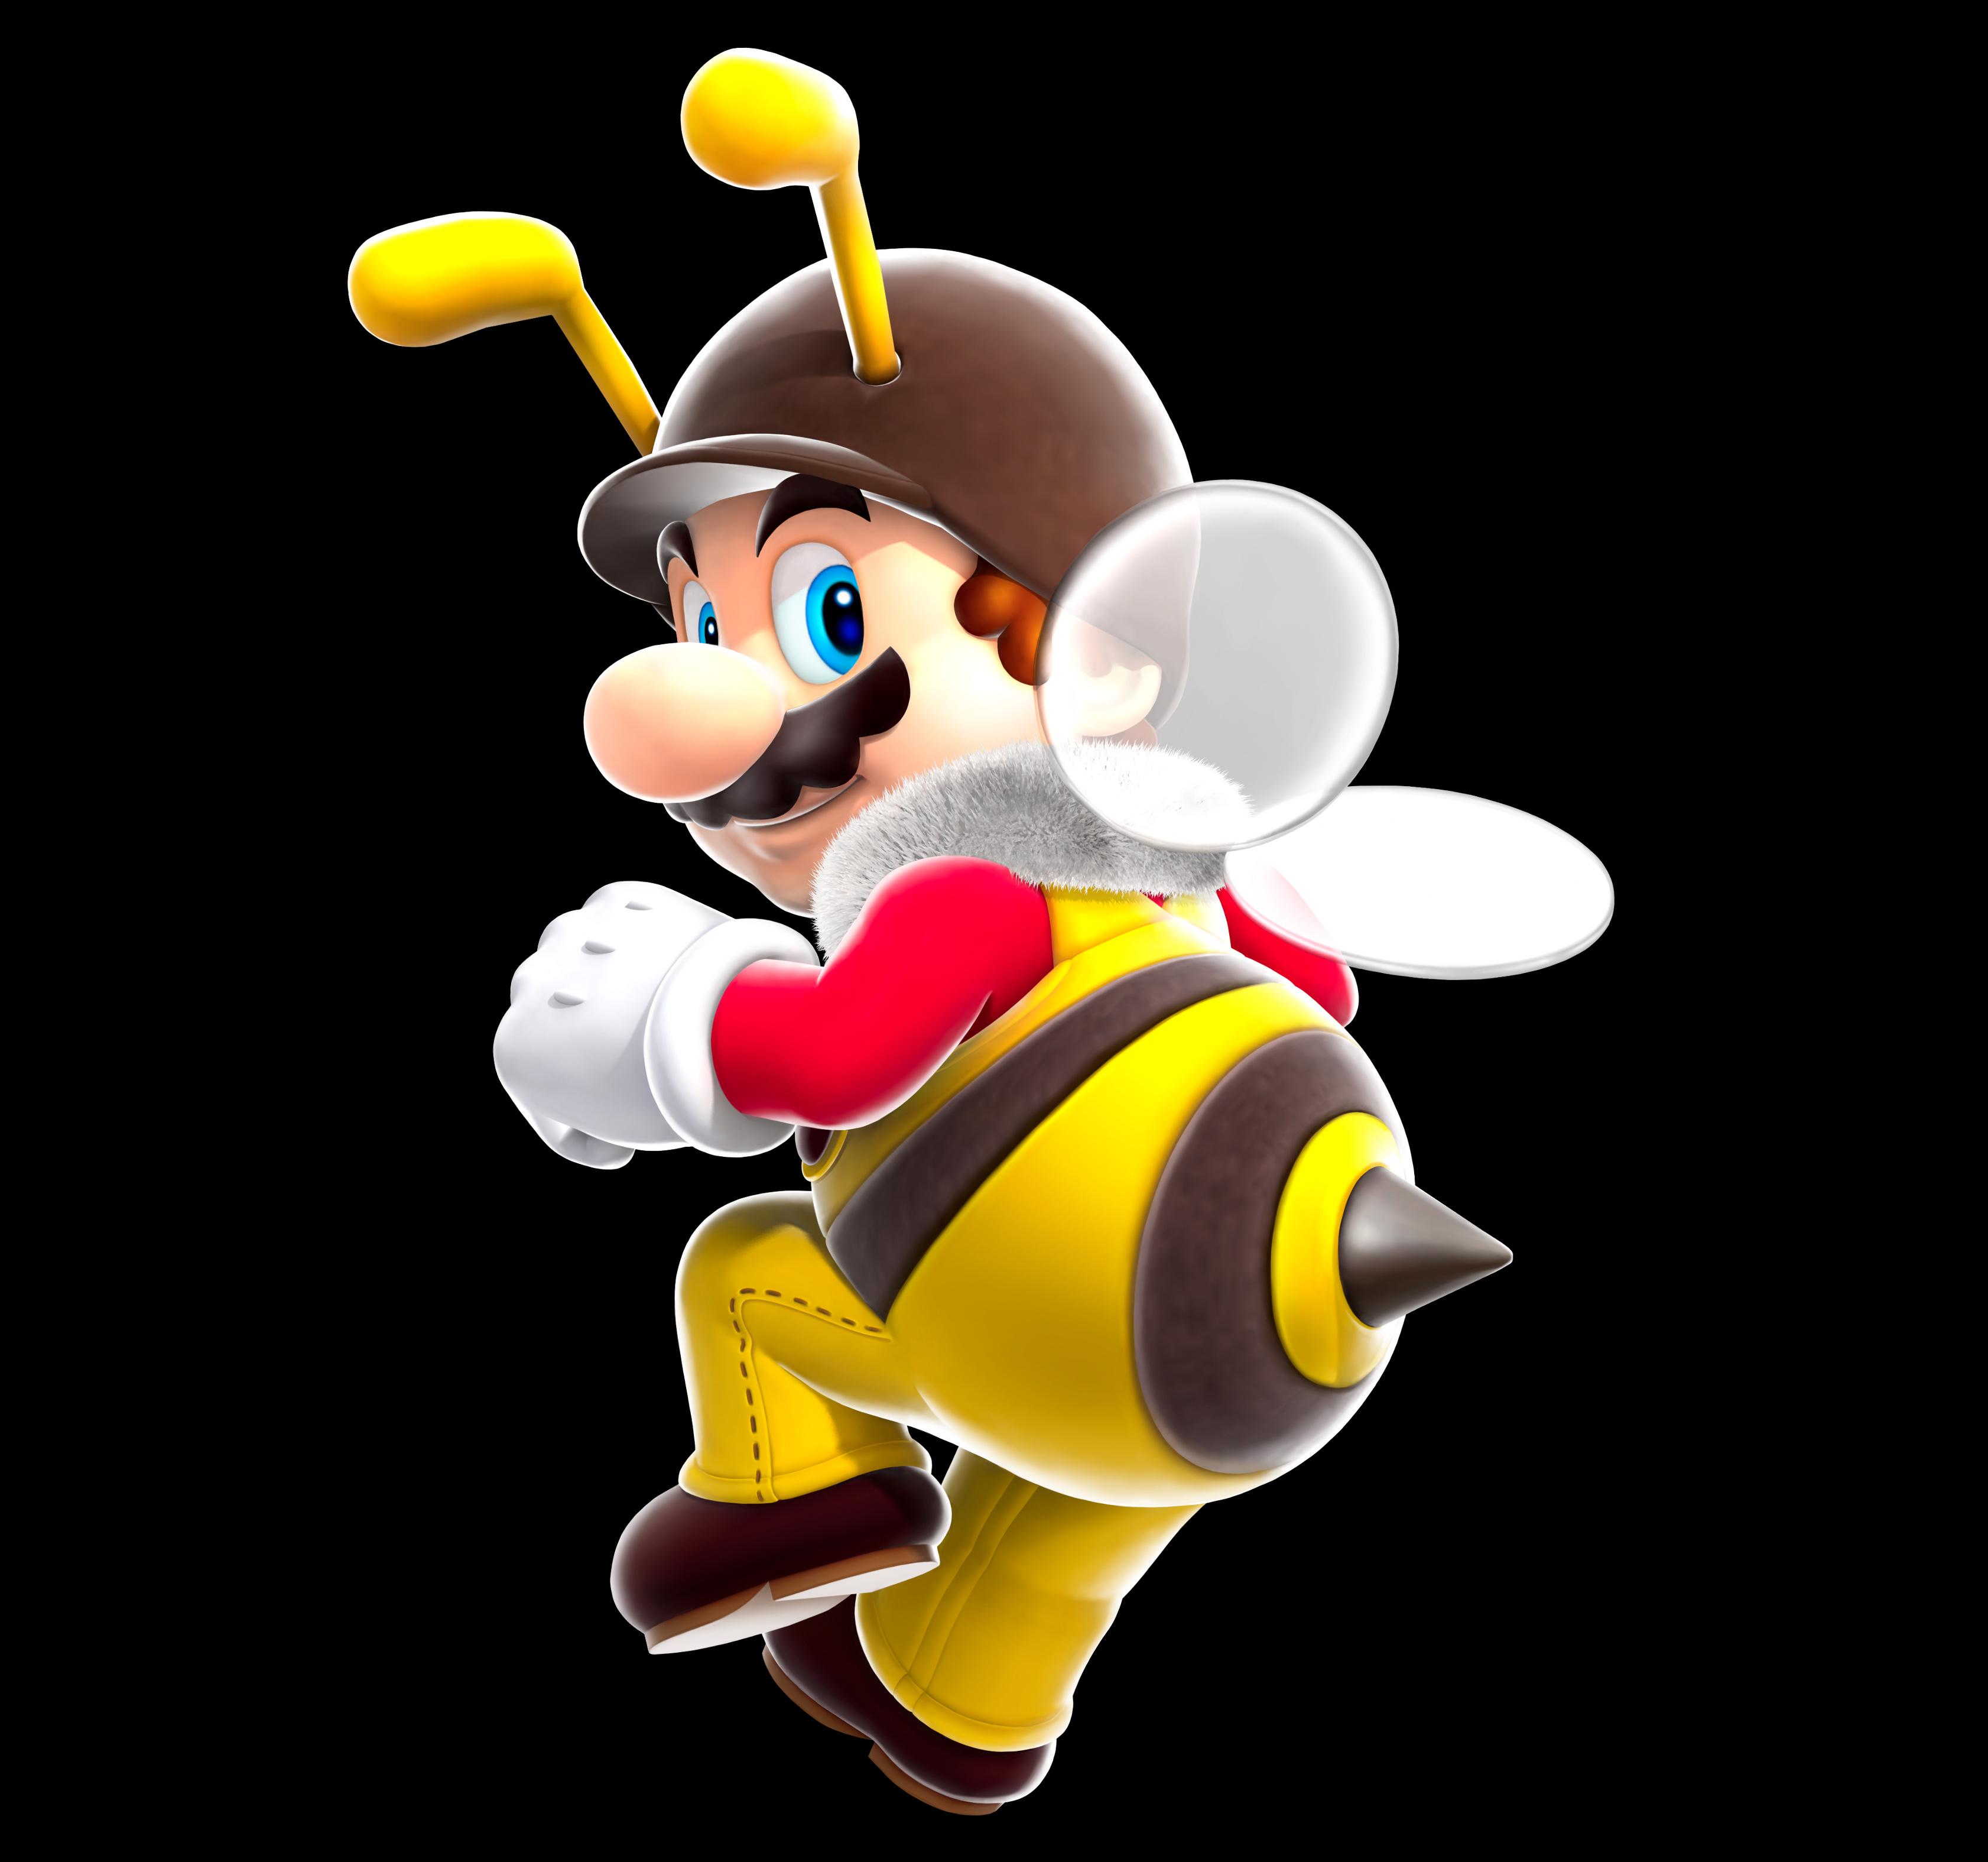 Original Golden Bunny Mario 64